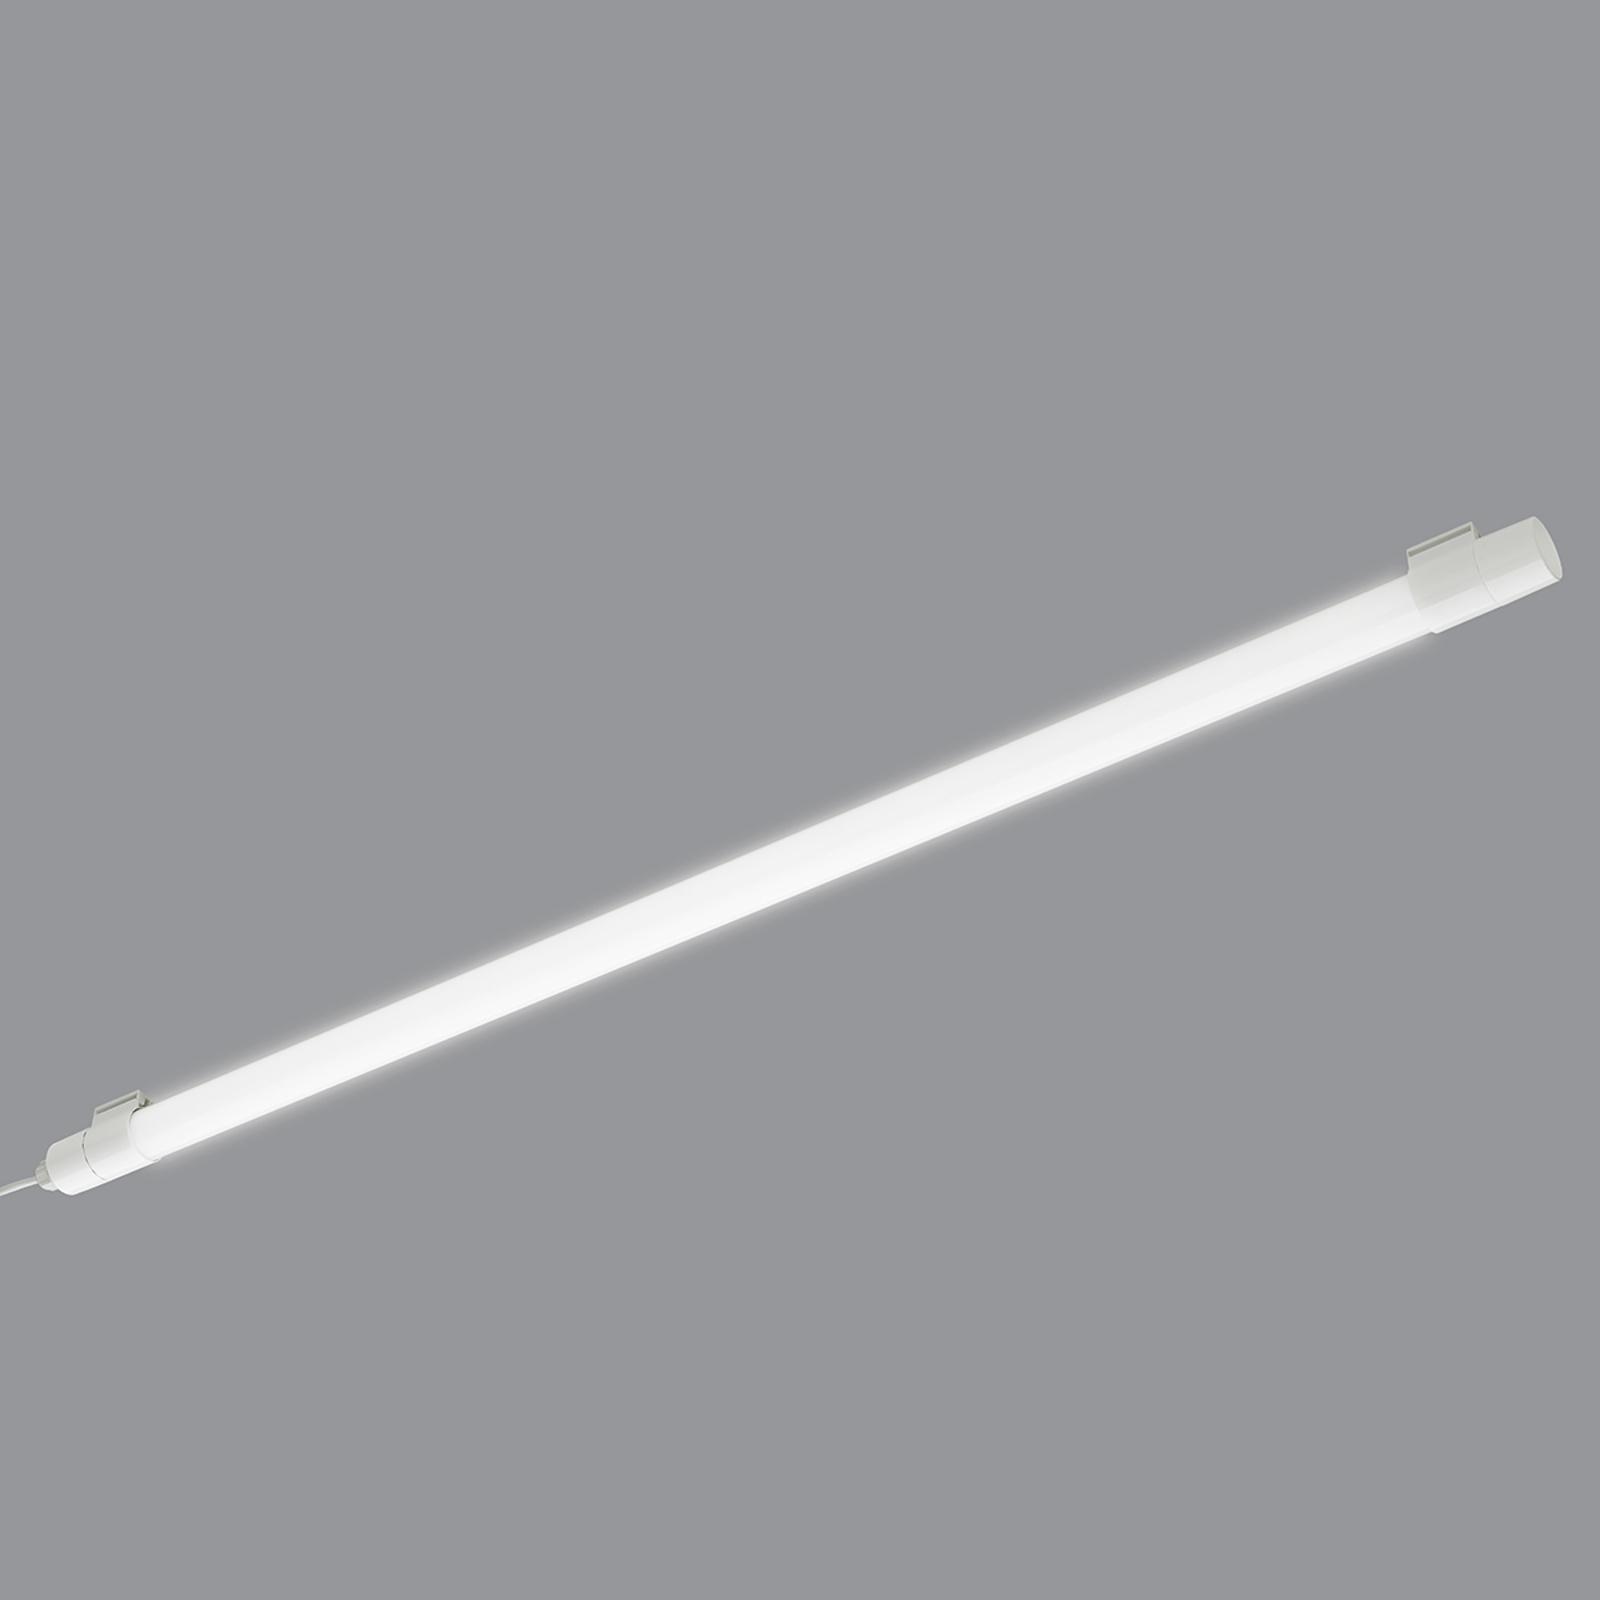 LED-Lichtleiste Start Batten IP65, 20 W, 3.000 K